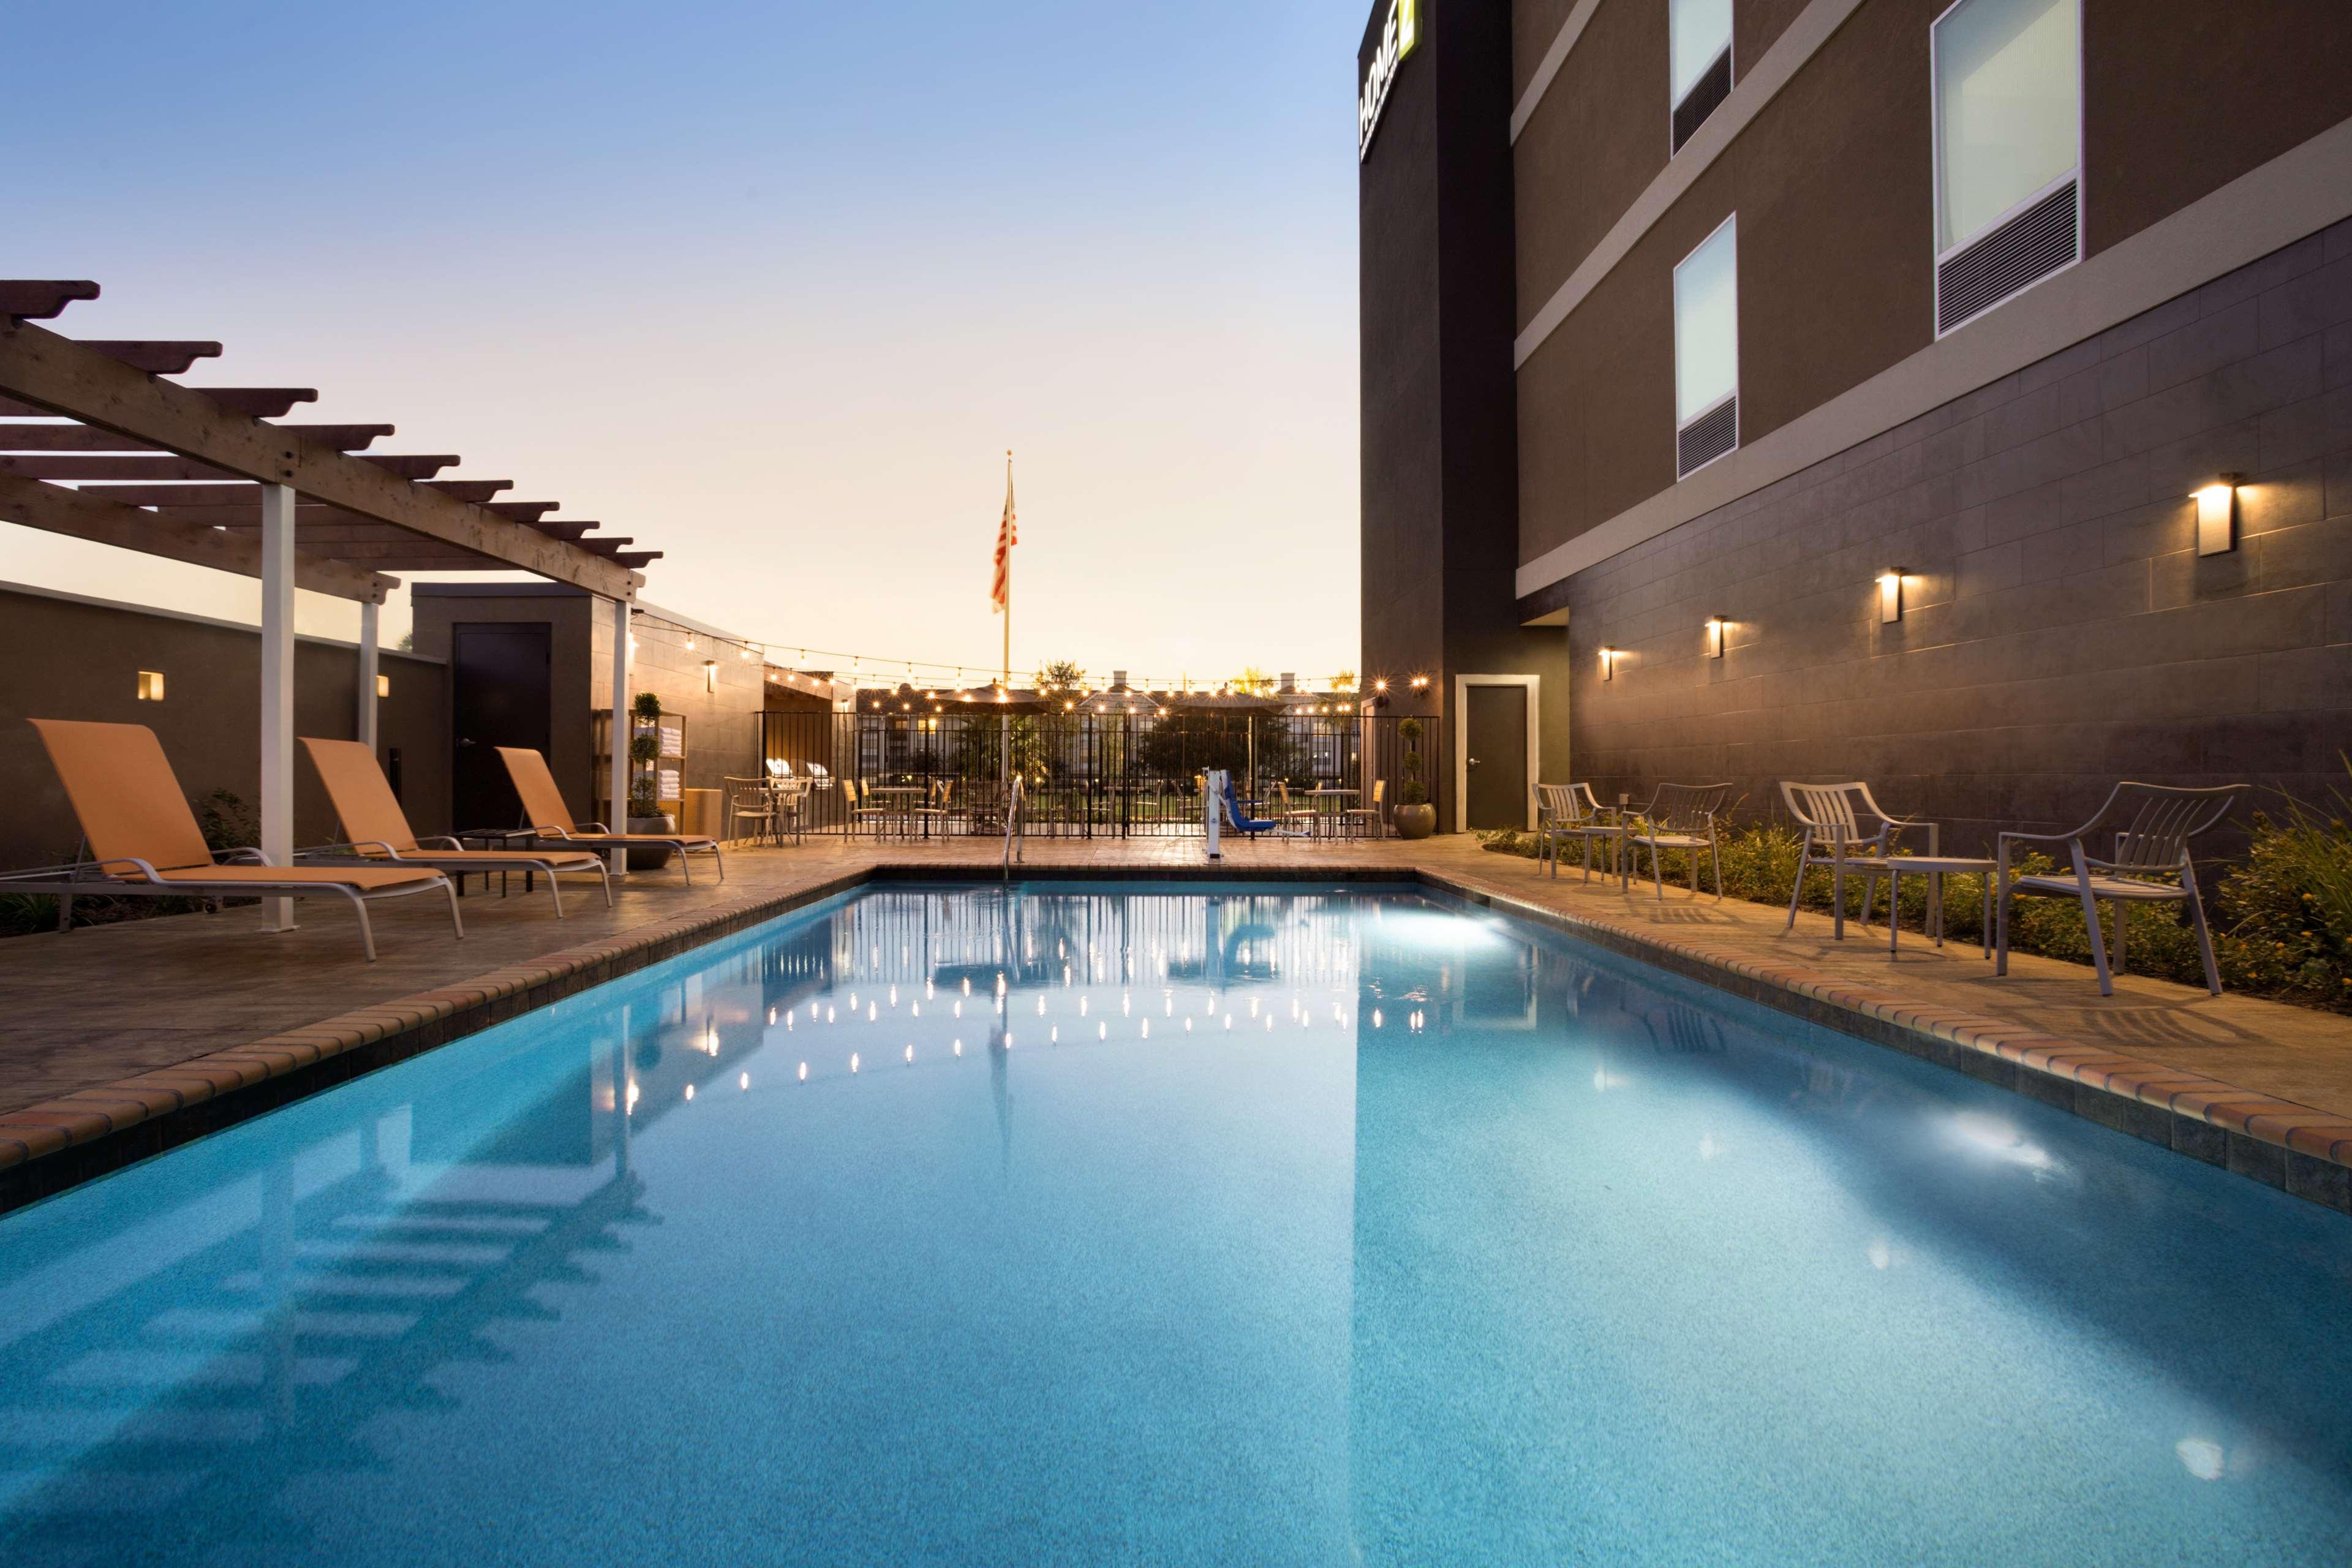 Home2 Suites by Hilton Houston/Webster image 4